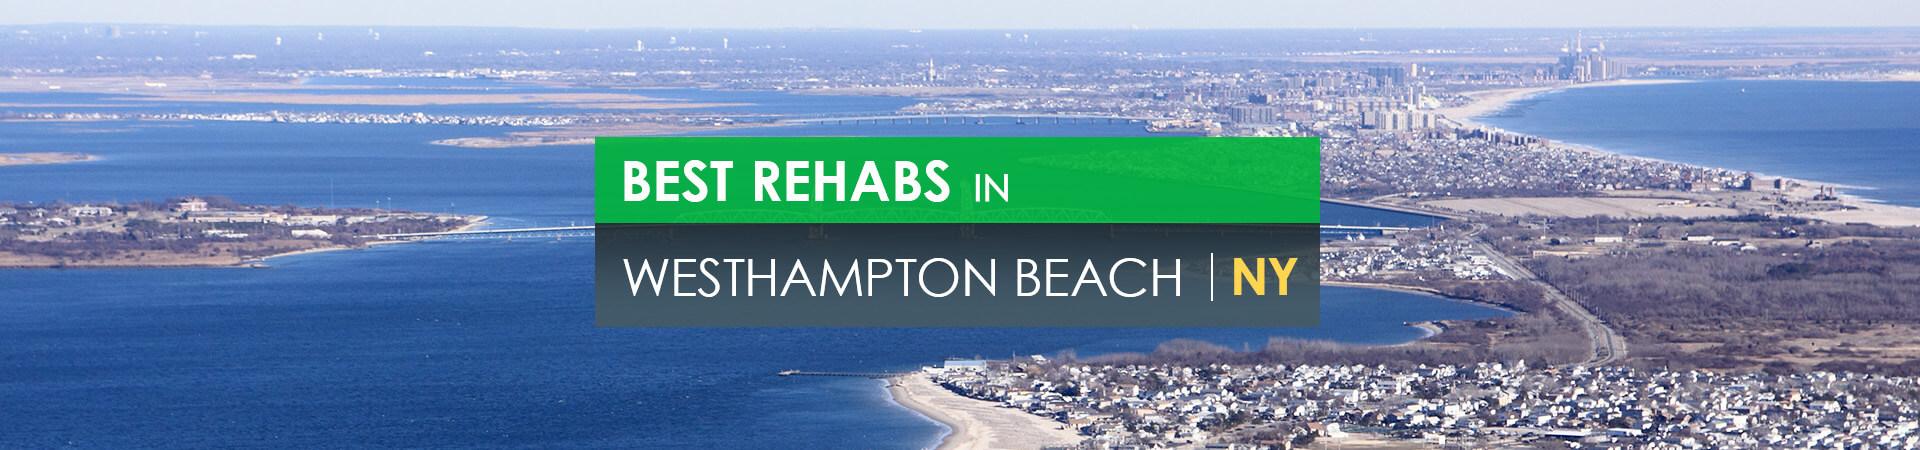 Best rehabs in Westhampton Beach, NY